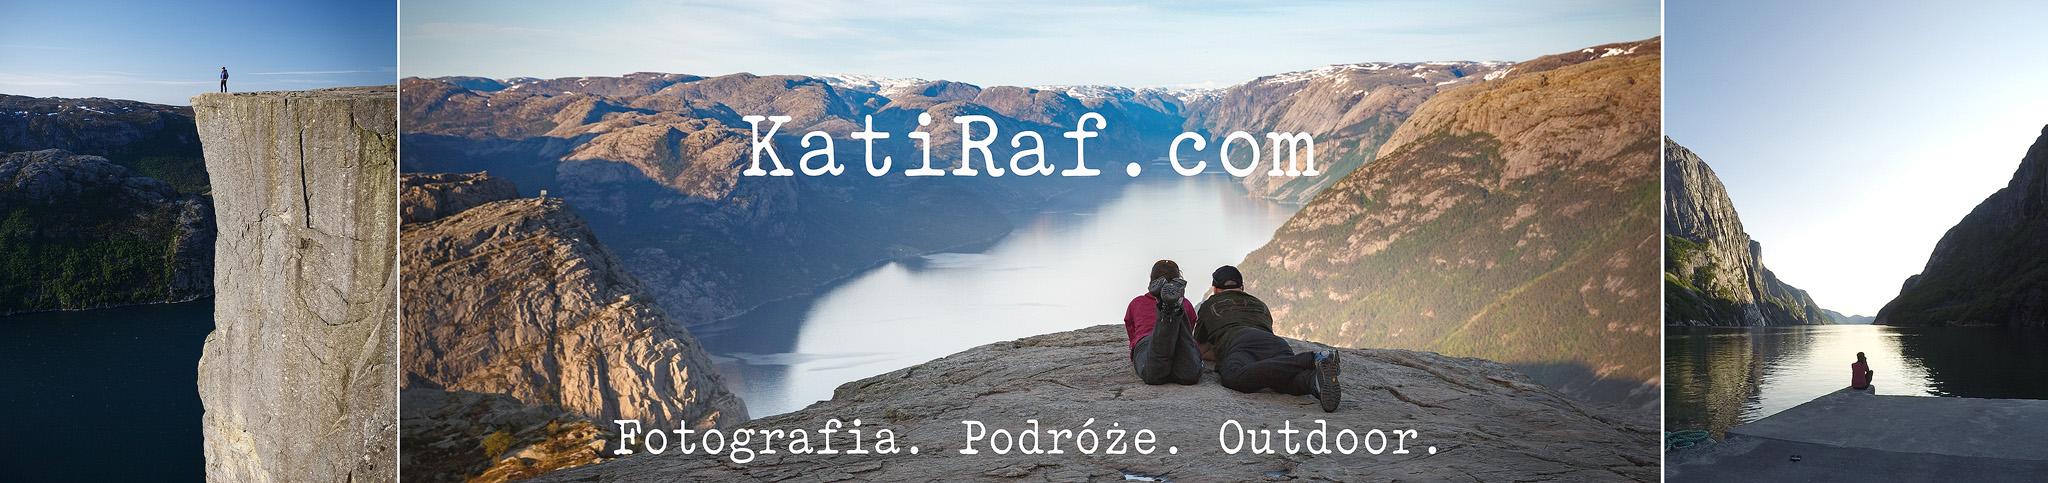 KatiRaf.com